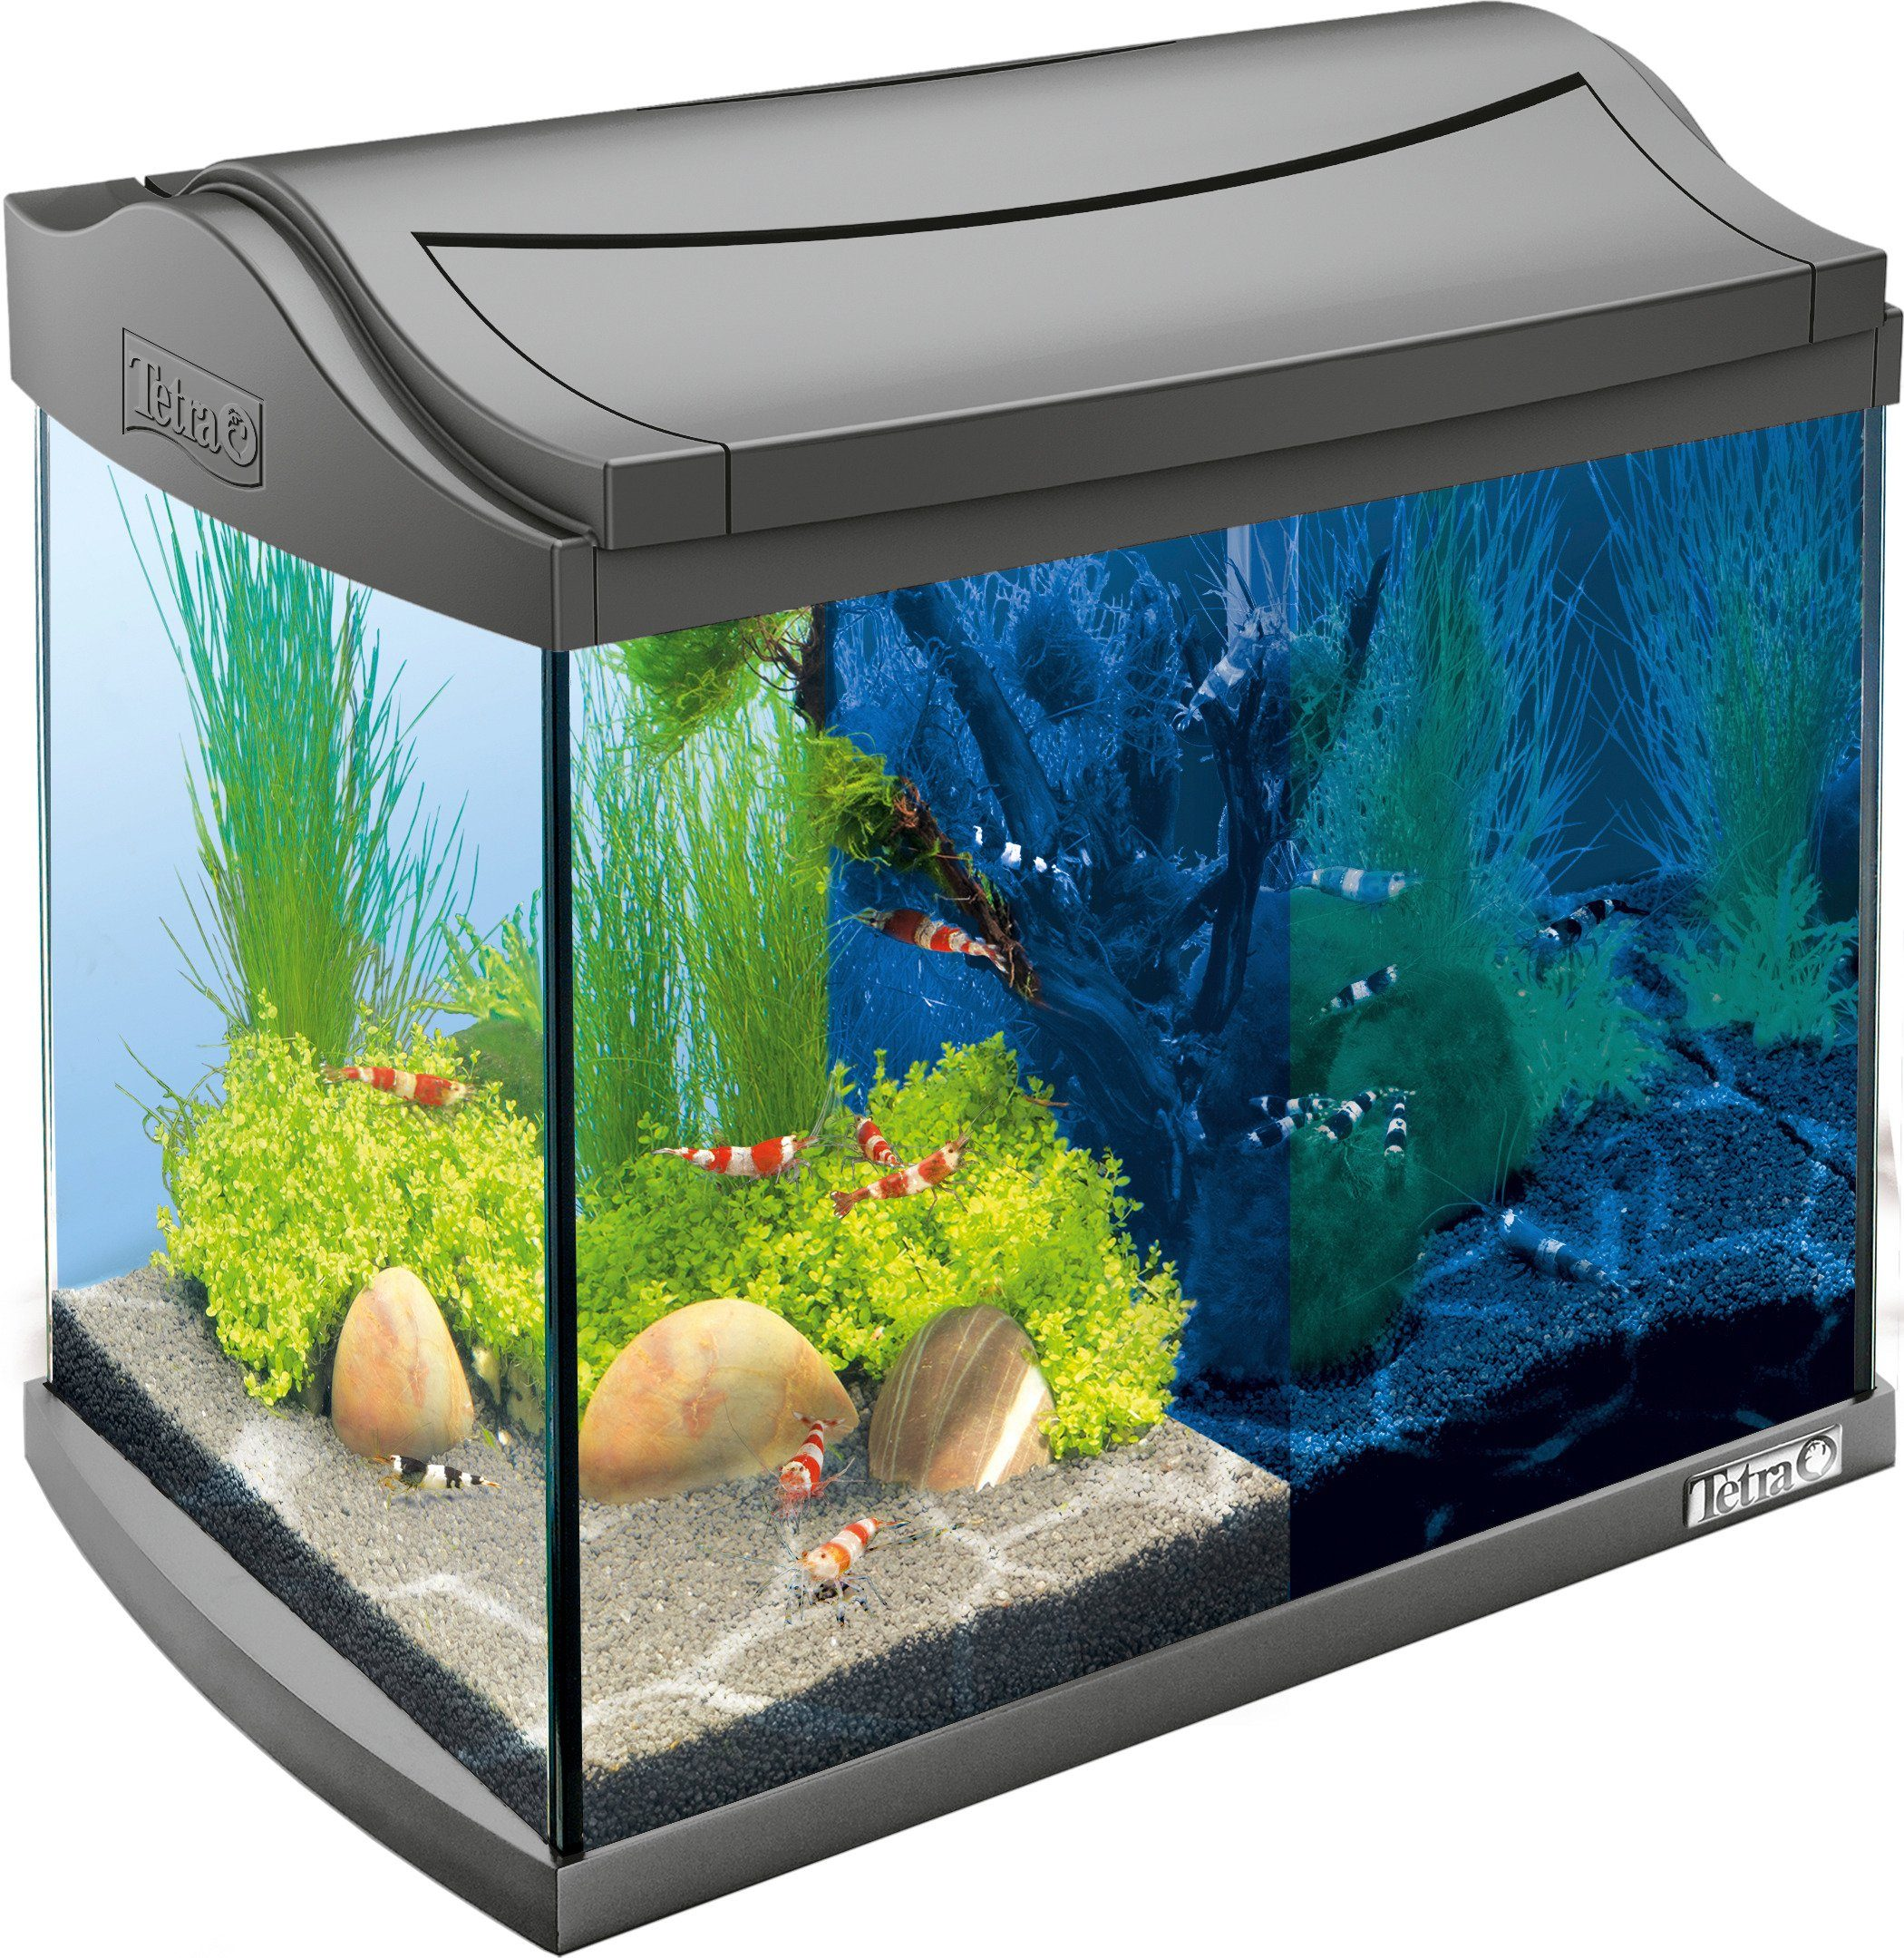 Tetra Aquarium »AquaArt LED Discovery Line« 20 l, anthrazit